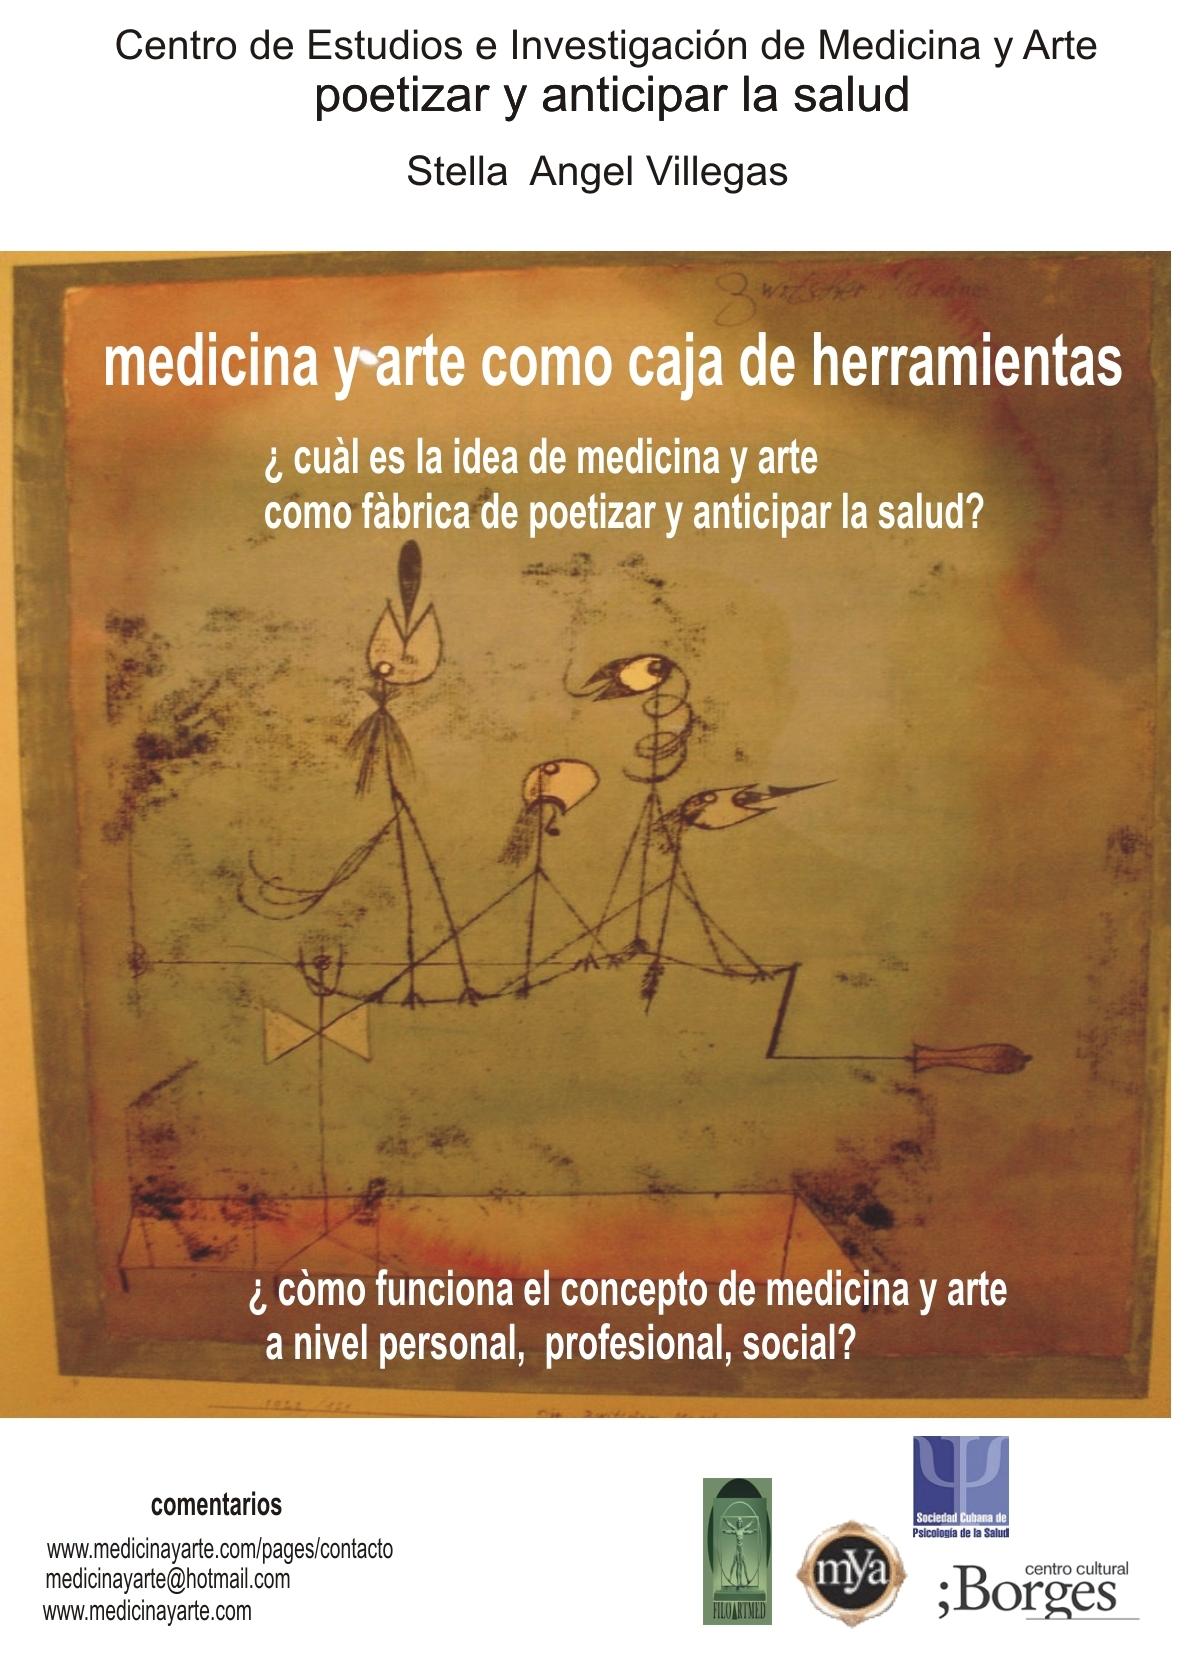 http://www.medicinayarte.com/img/caja_herramientas_mya_2013.jpg